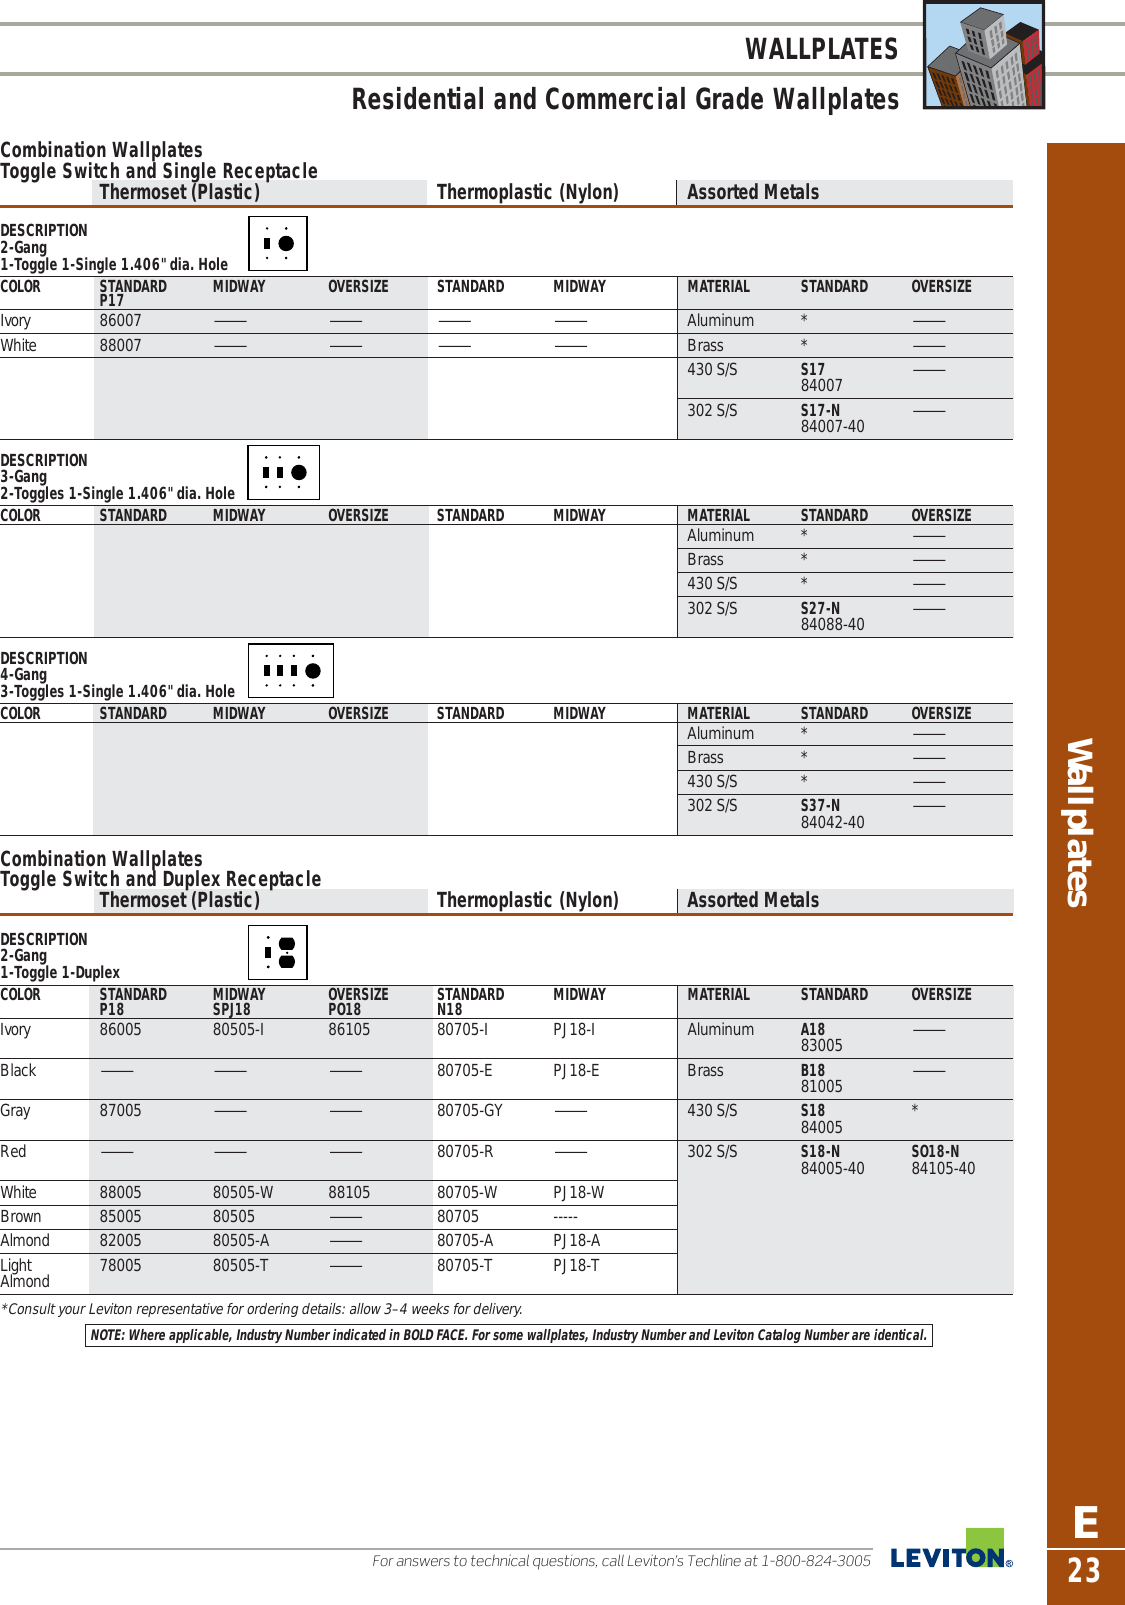 Gartenaccessoires Katalog Einzigartig Amhousejoy Rear Brake Master Cylinder for Polaris Sportsman